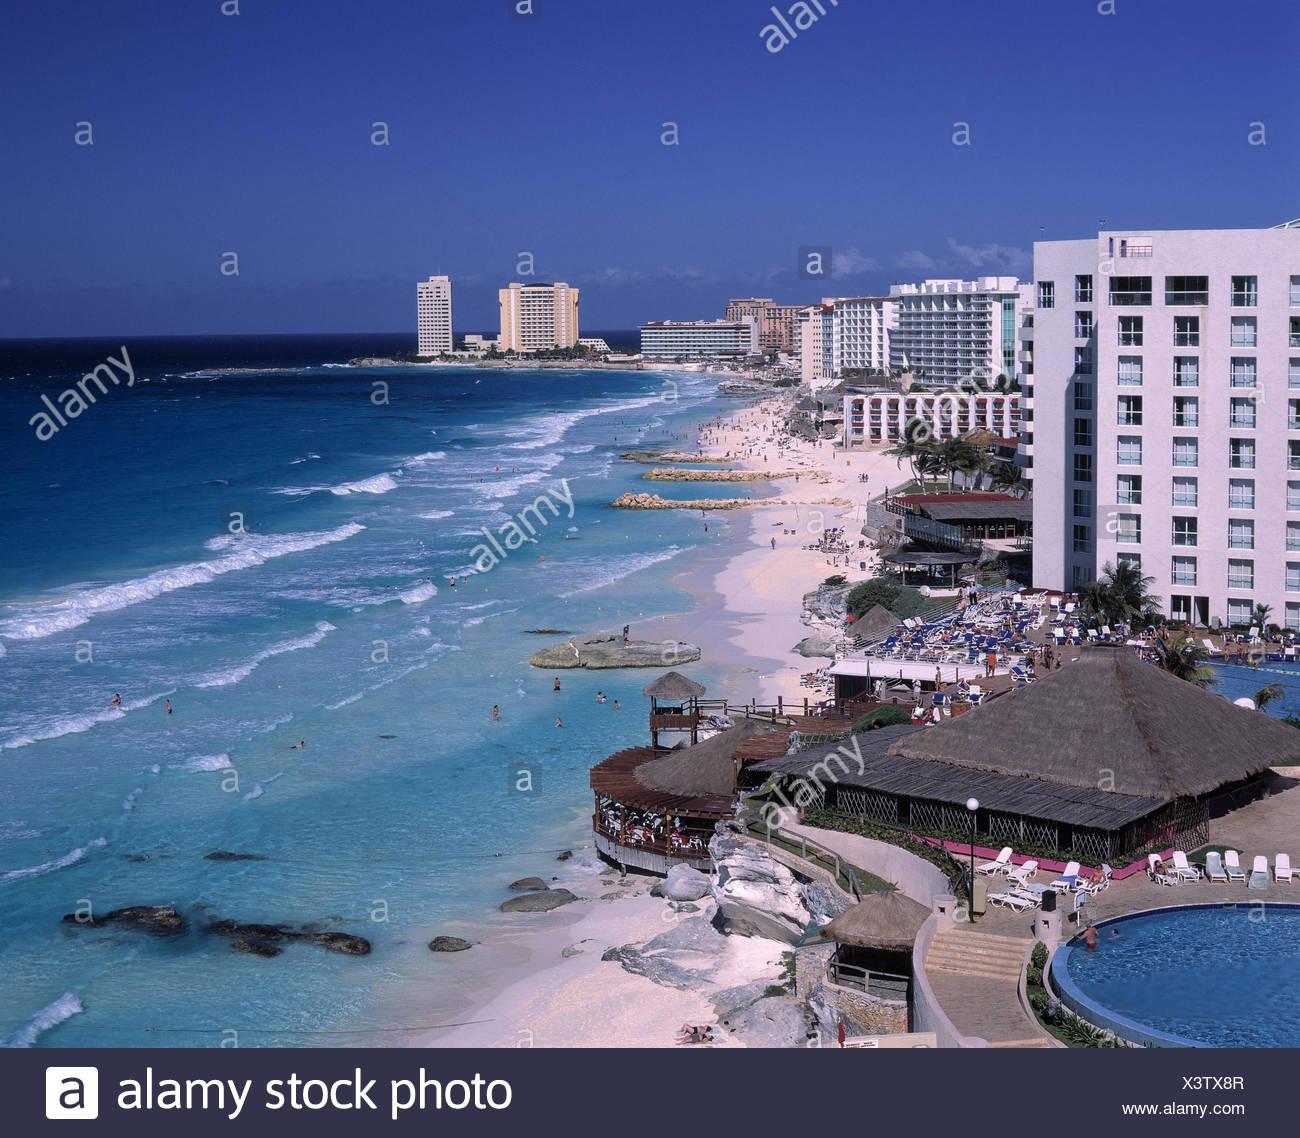 Mexico, Yucatan, Cancun, hotel facilities, swimming pool, beach hotel, sun terrace - Stock Image